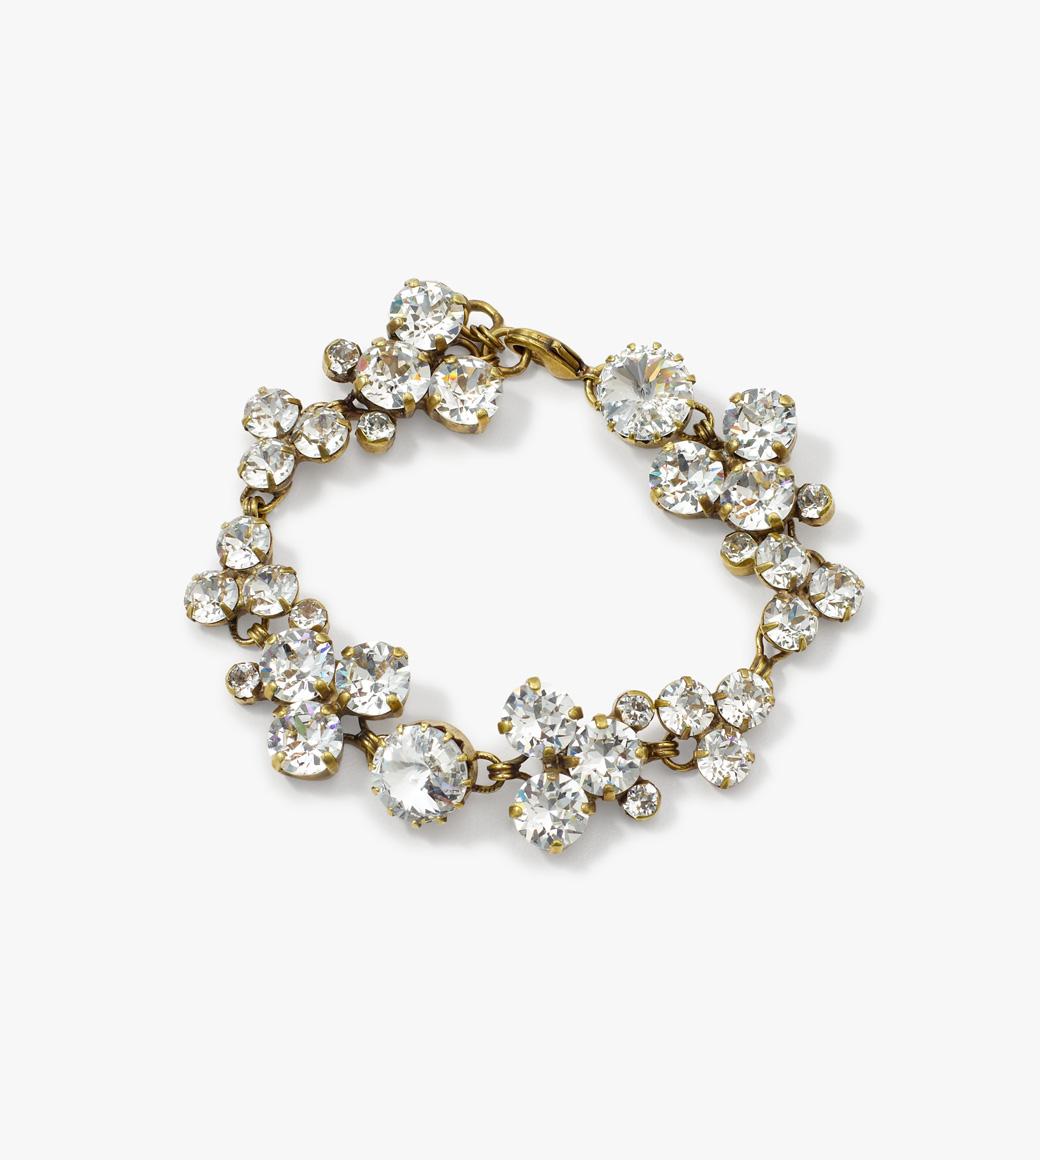 fashion jewelry ornate bracelets MVQAACV